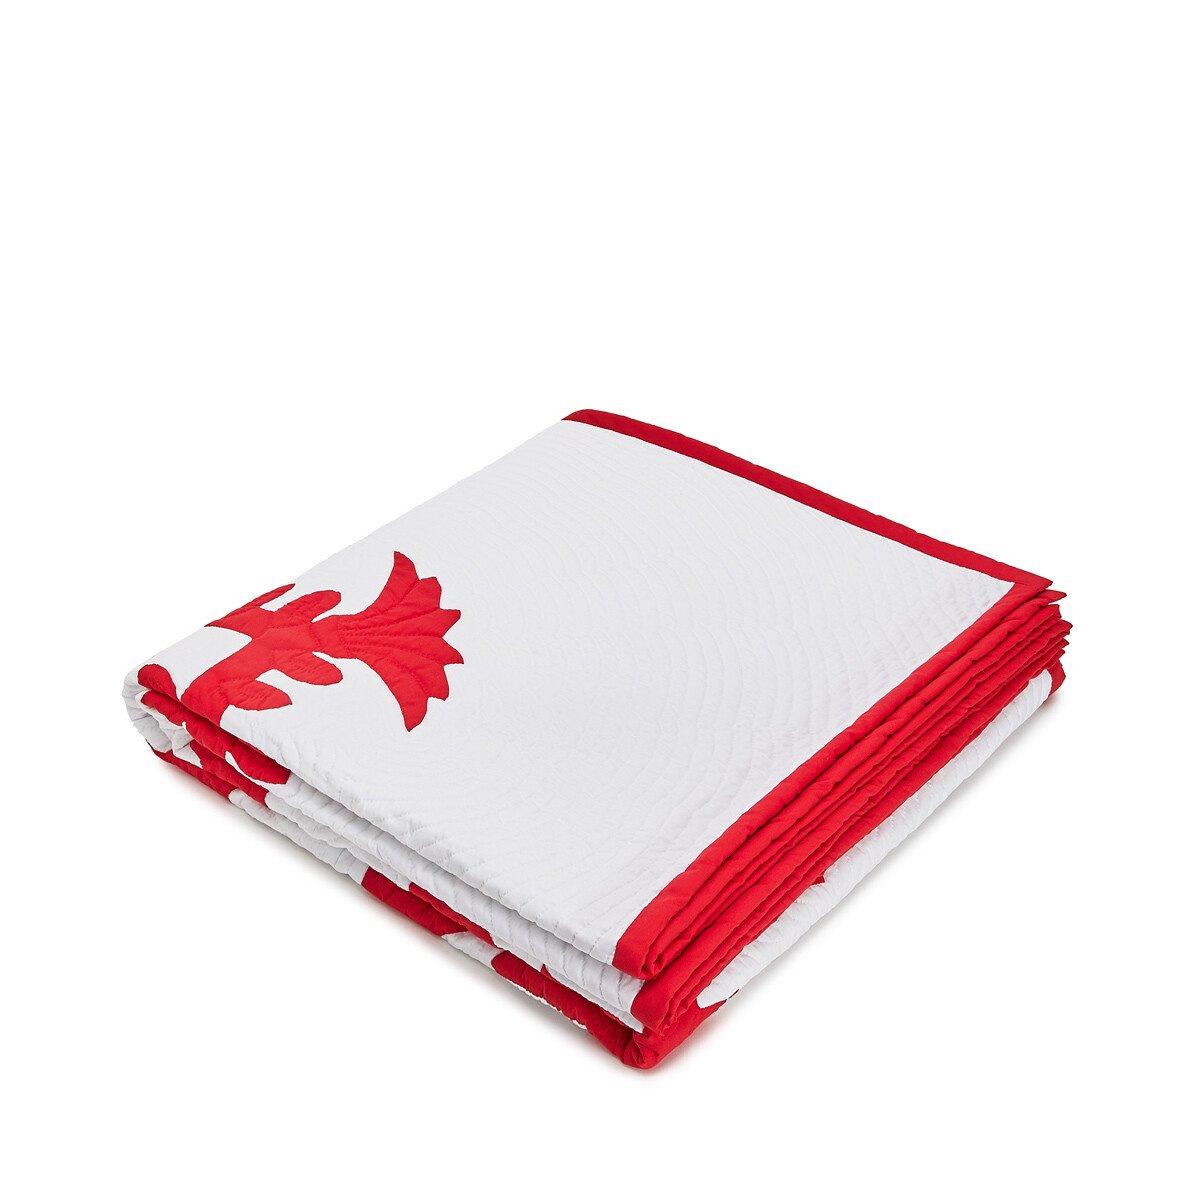 230X230 Blanket Pele & Lehua